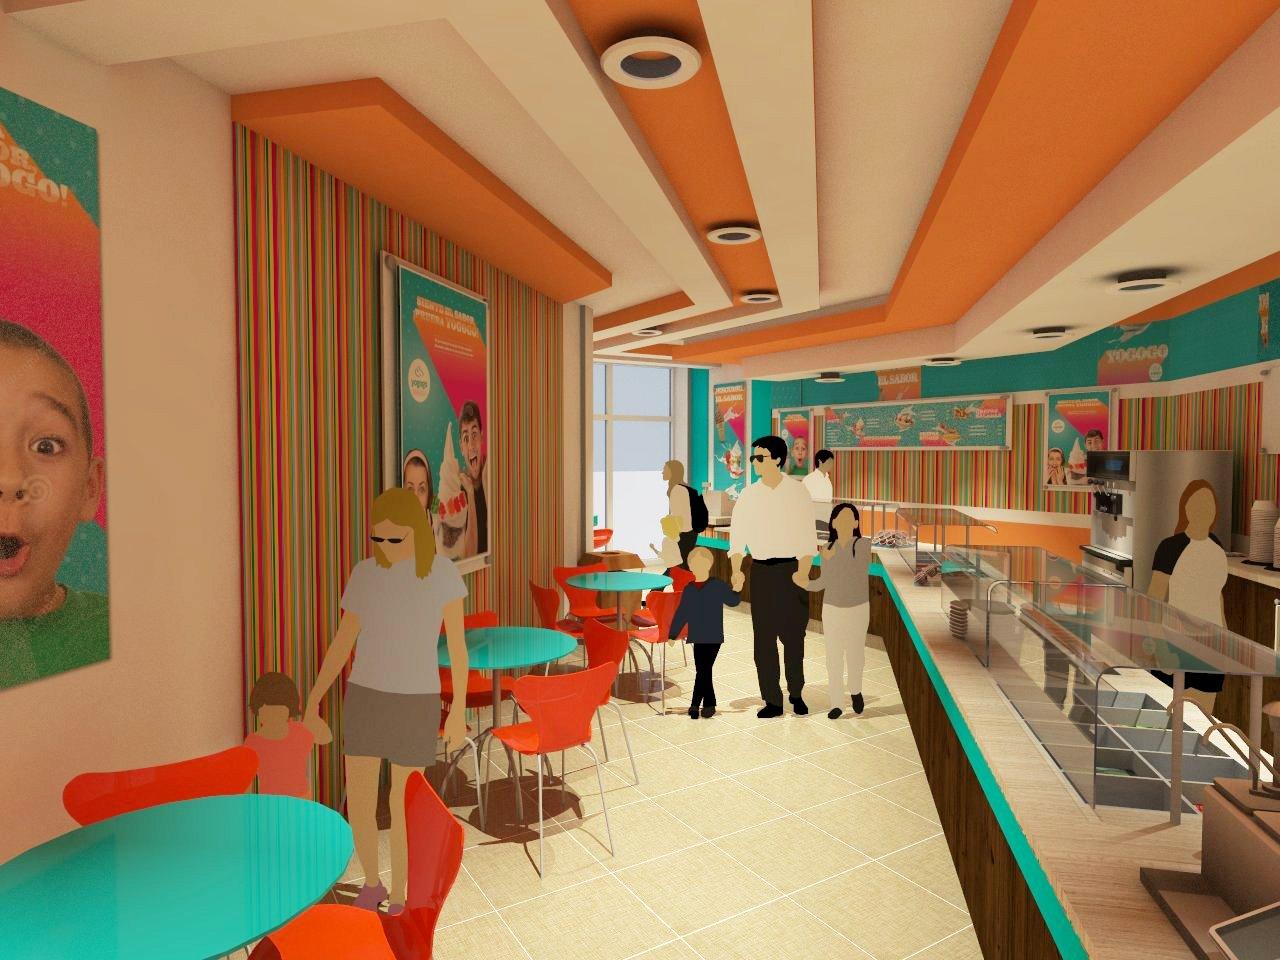 Arquitectura martin abel local comercial yogurt yogogo - Arquitectura interior ...